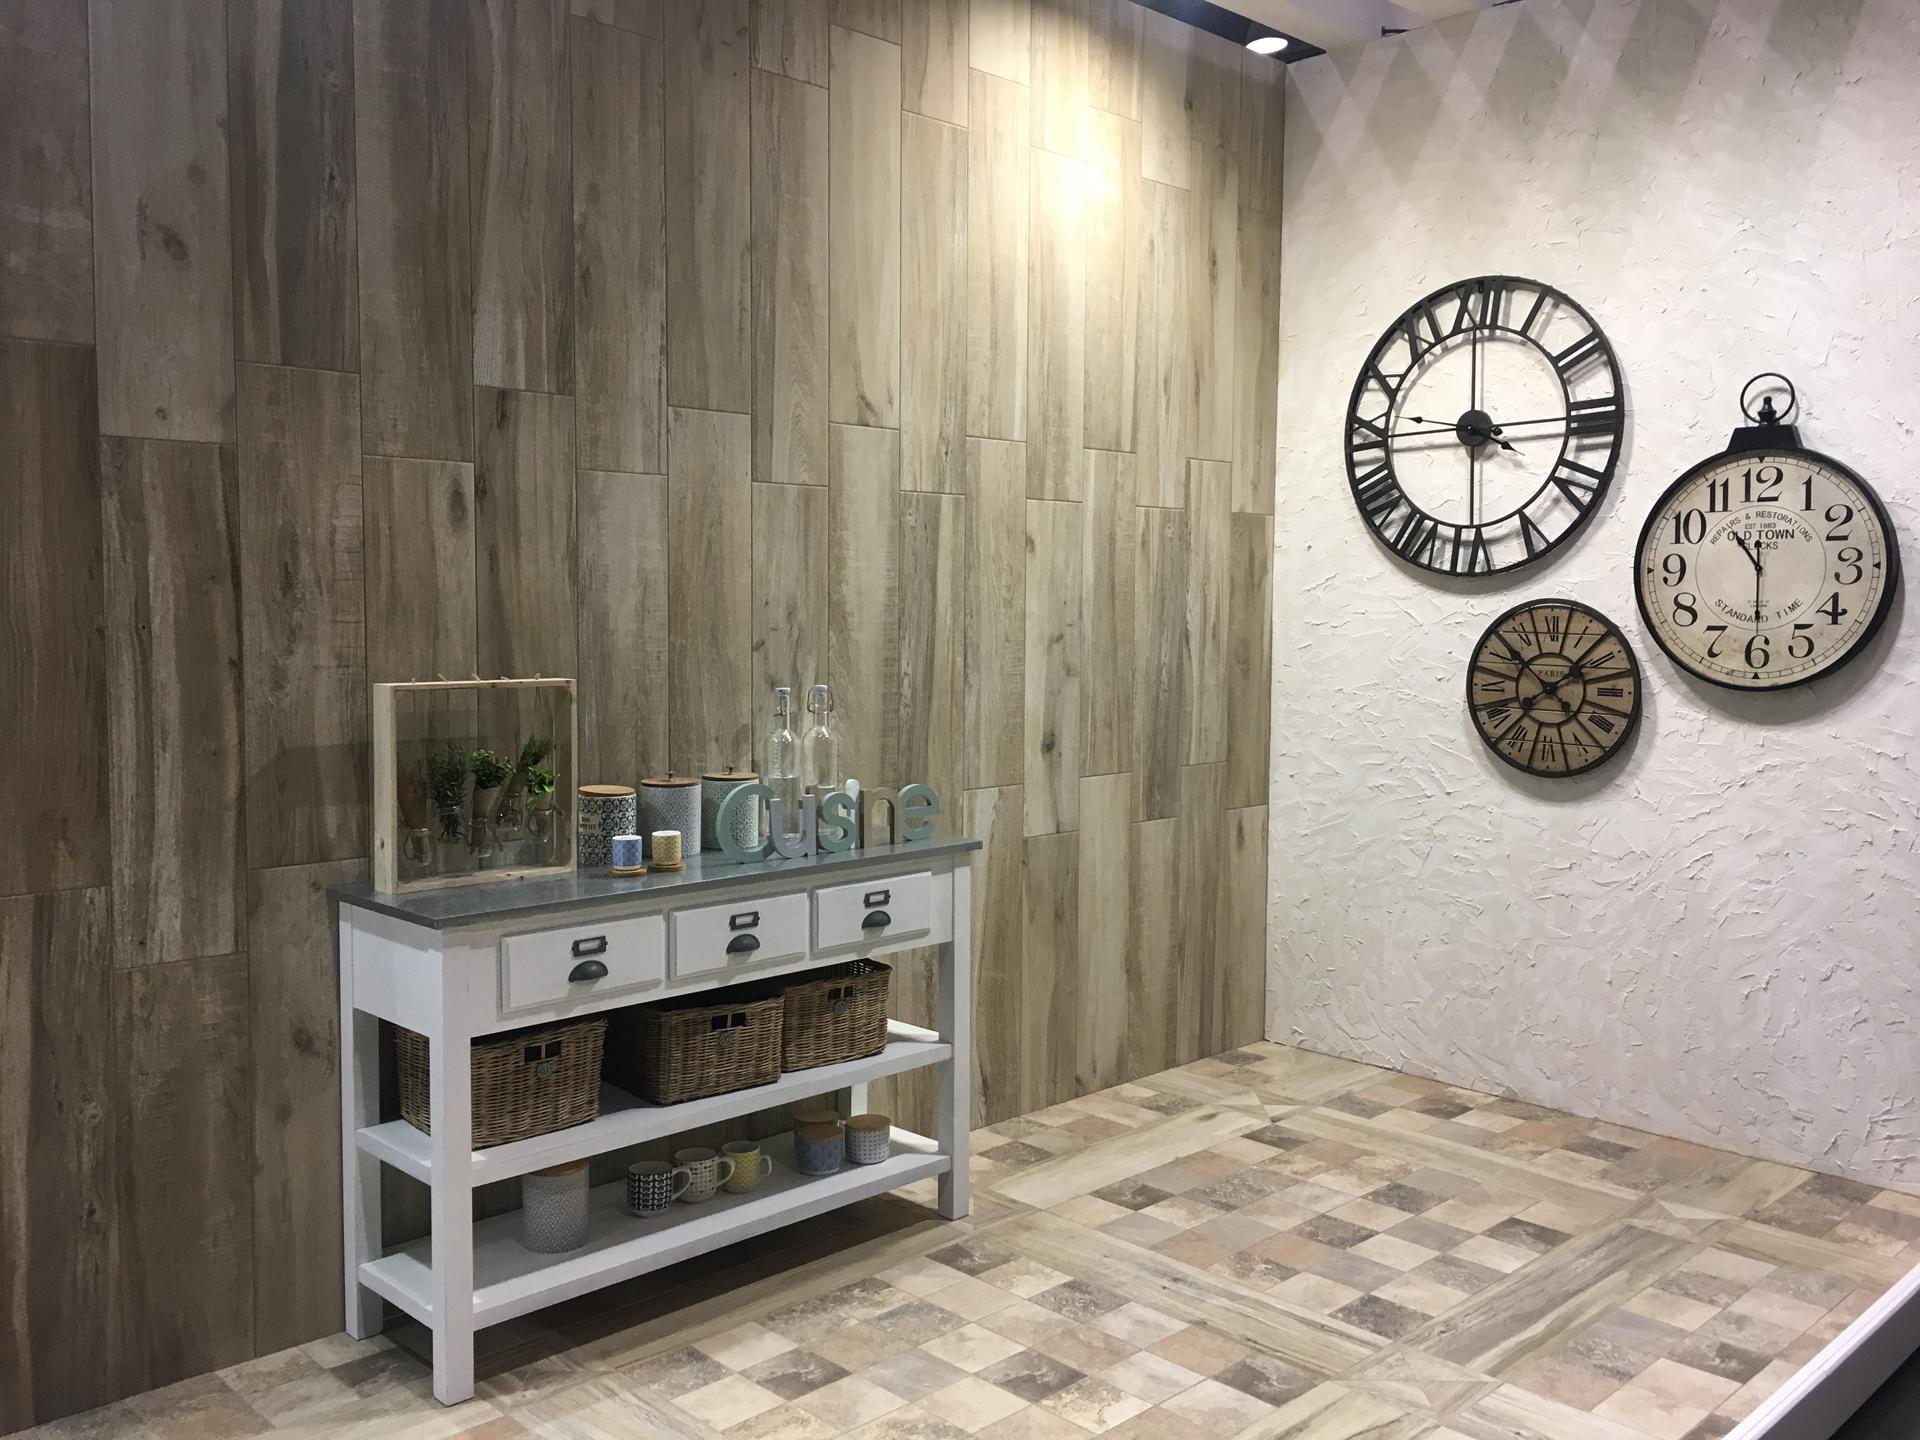 feria-cevisama-valencia-2018-decoracion-interiorismo-6